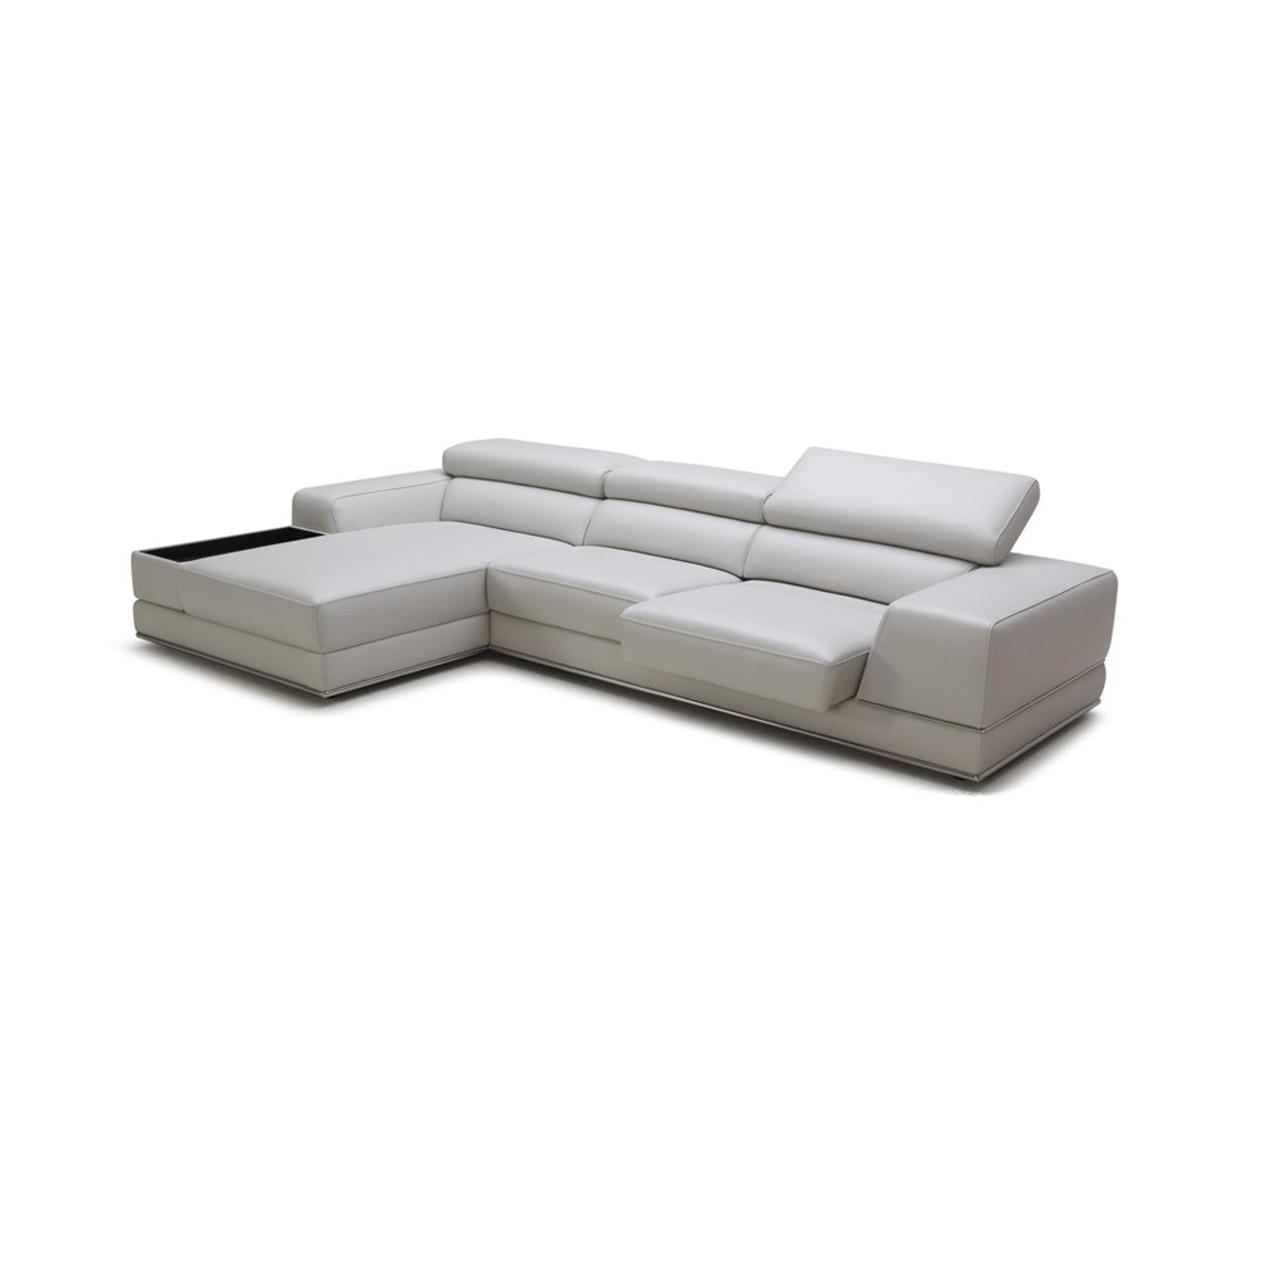 t35 mini modern white leather sectional sofa and loveseat slipcovers divani casa pella lounge la on sale